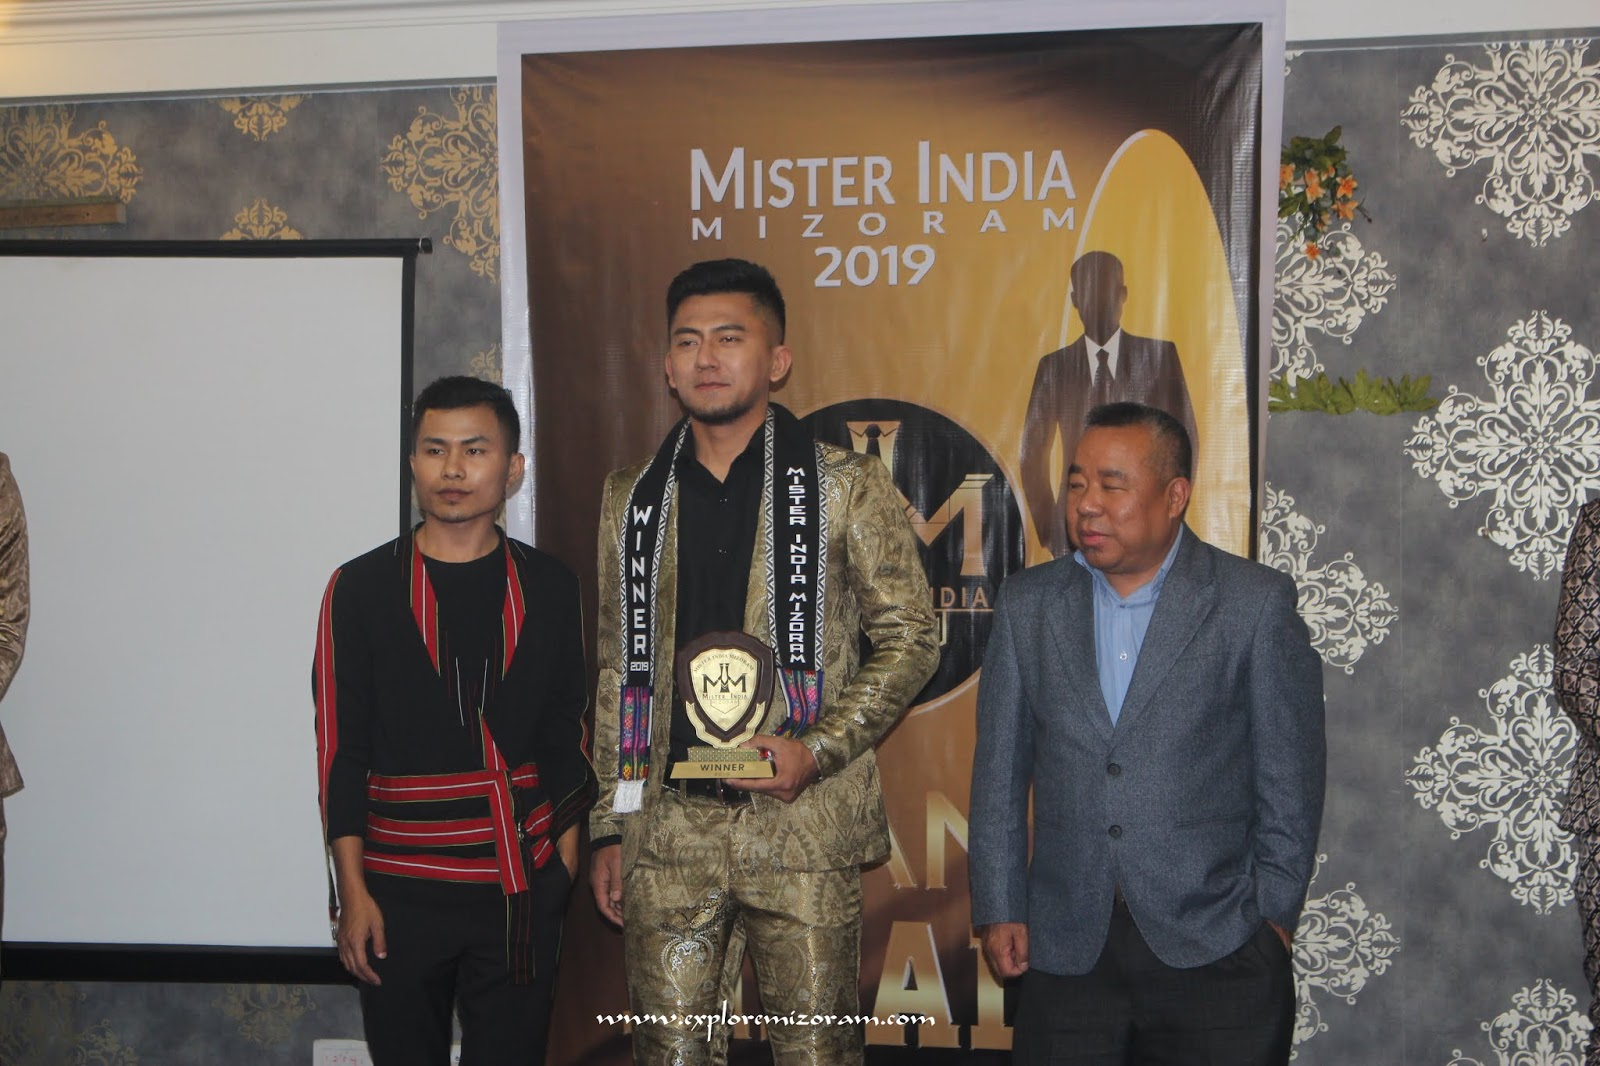 JONATHAN LALMUANPUIA THANGEO : Mister India Mizoram 2019